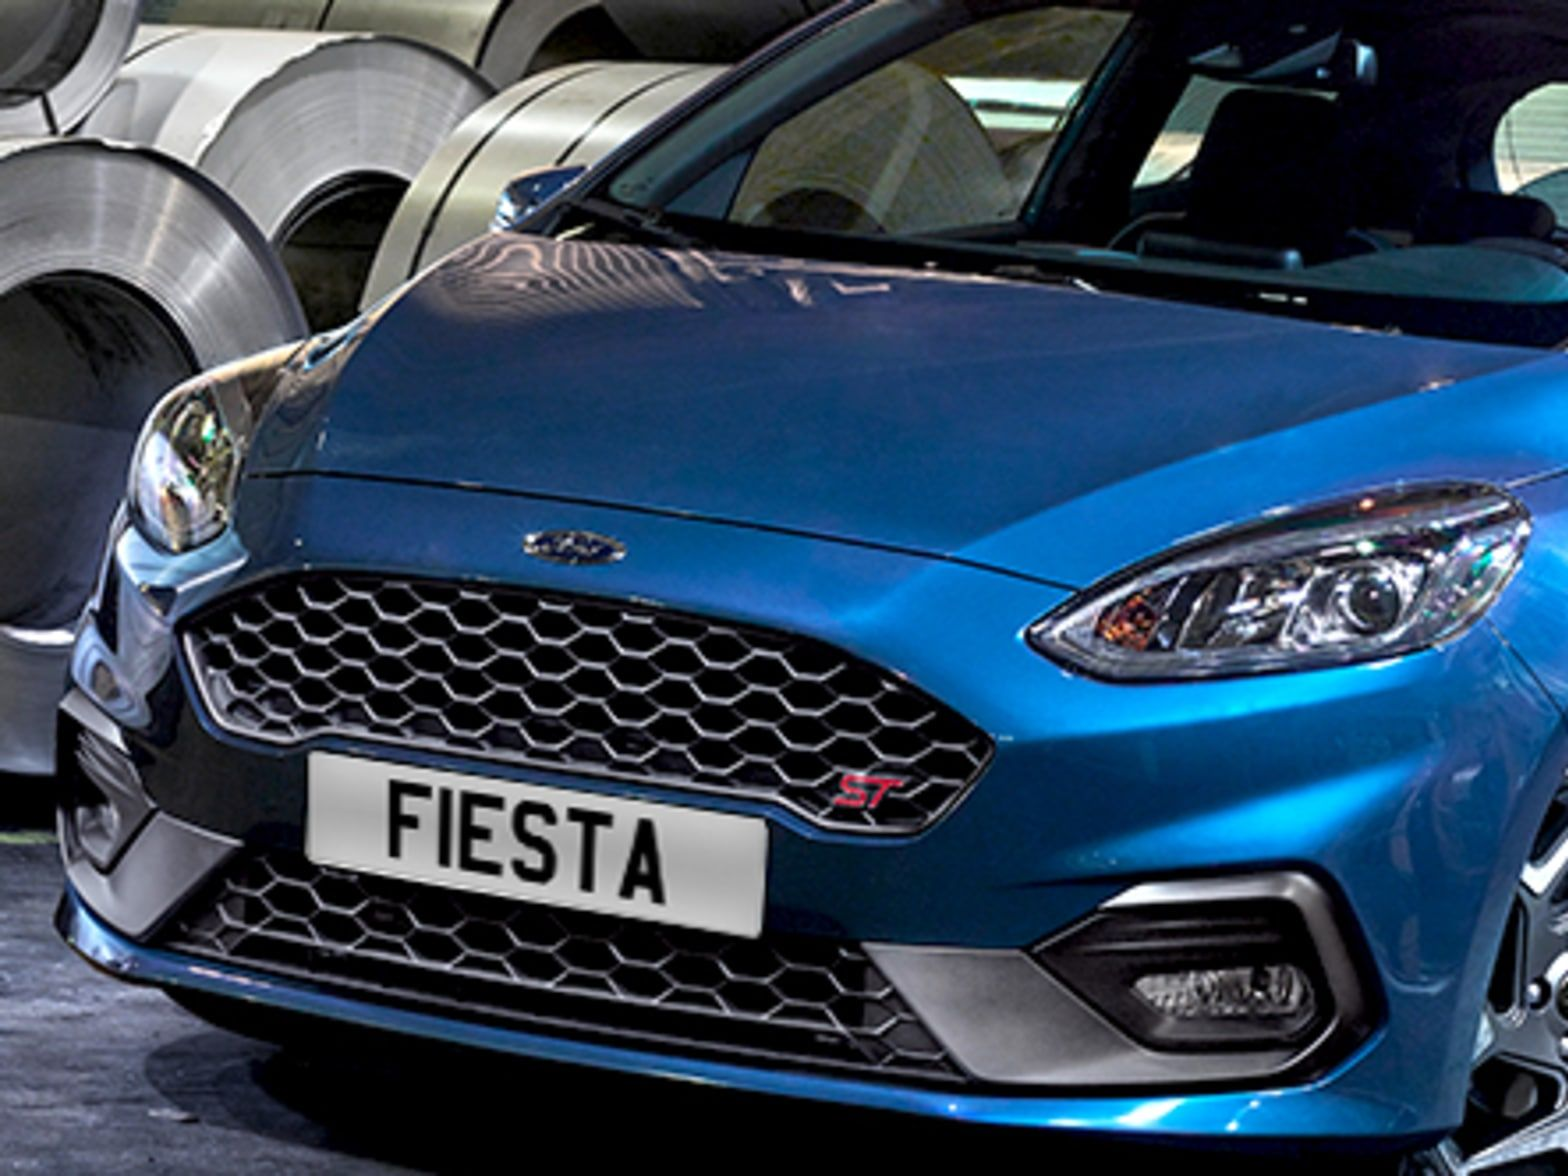 New Fiesta St Ford Fiesta St Fiesta St Ford Fiesta